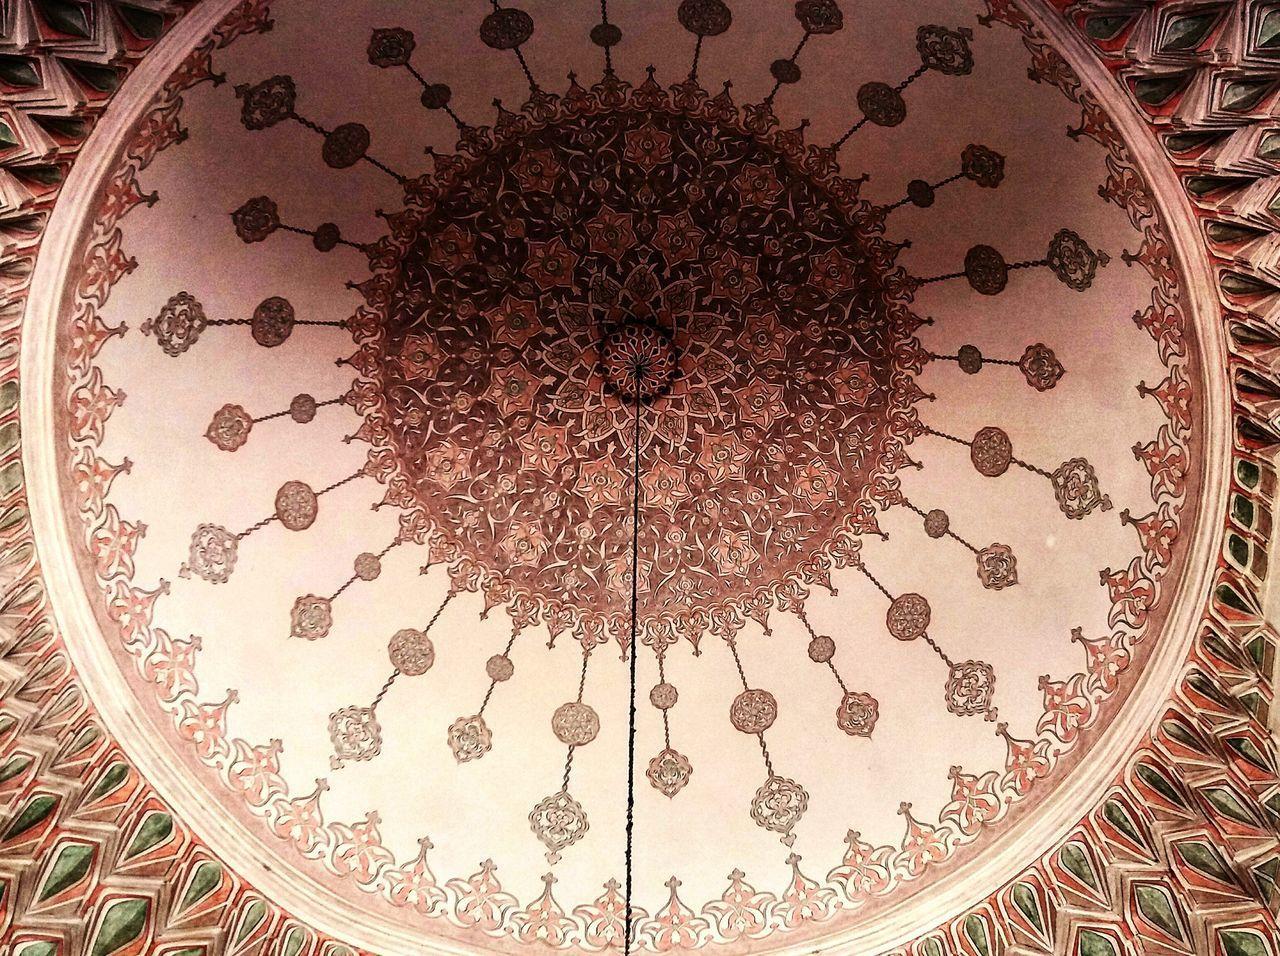 Mosque Sarajevo Bosnia And Herzegovina Photography Art Architecture Colors Ornaments